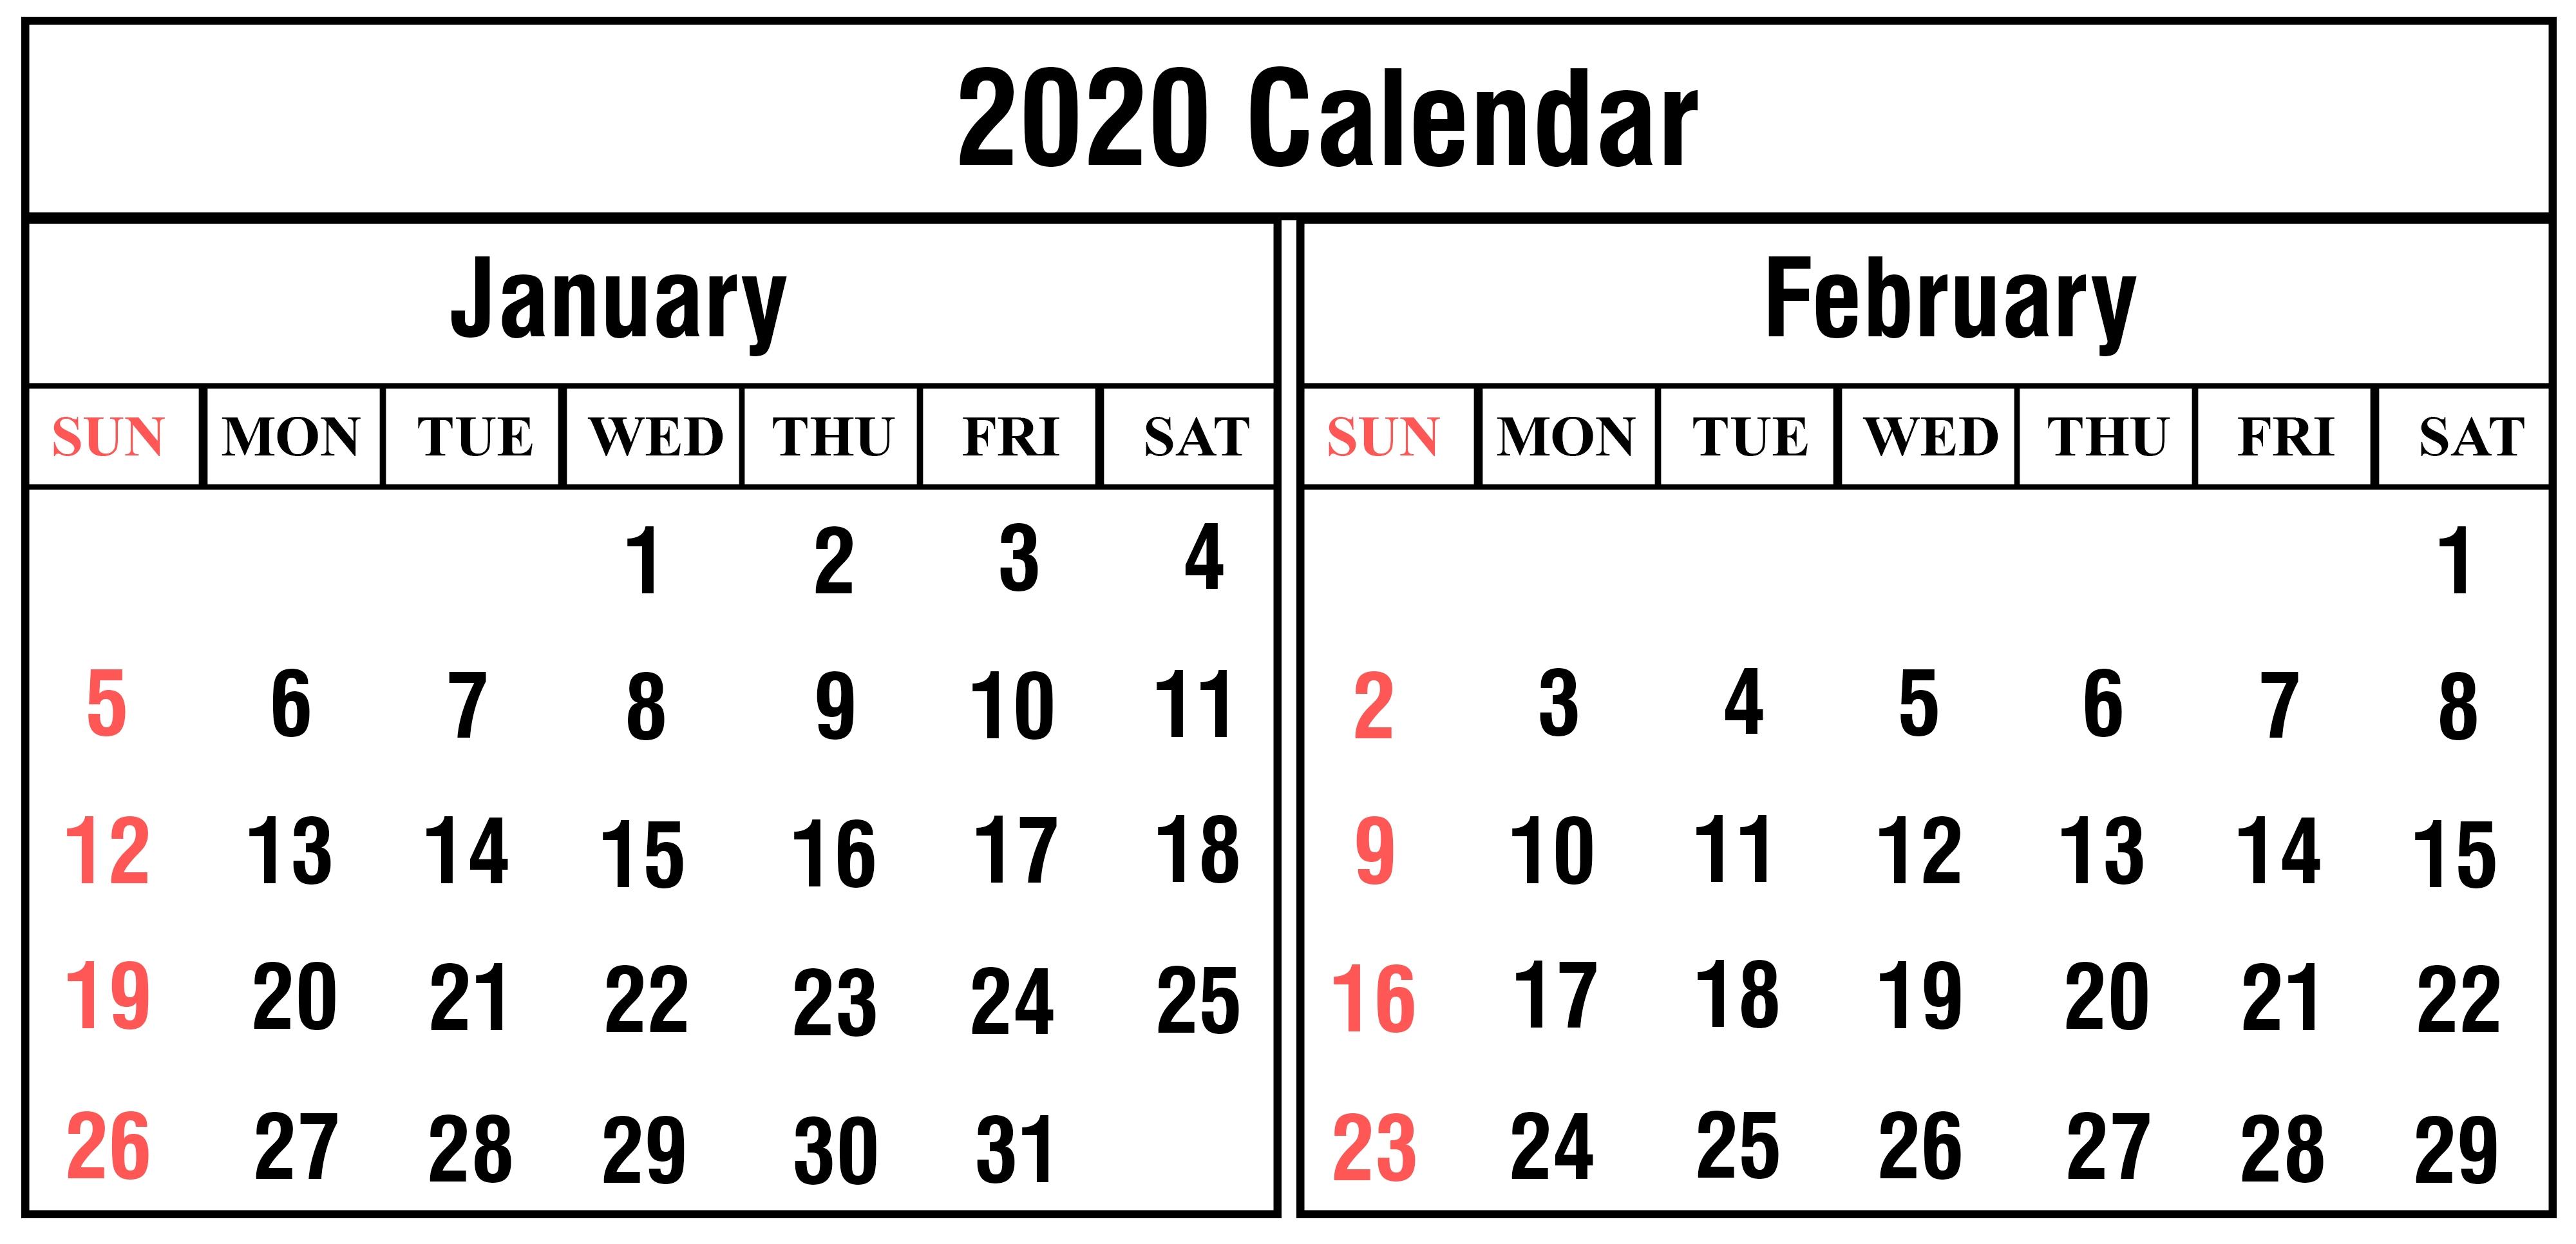 Free January And February 2020 Calendar Templates-January And February 2020 Calendar